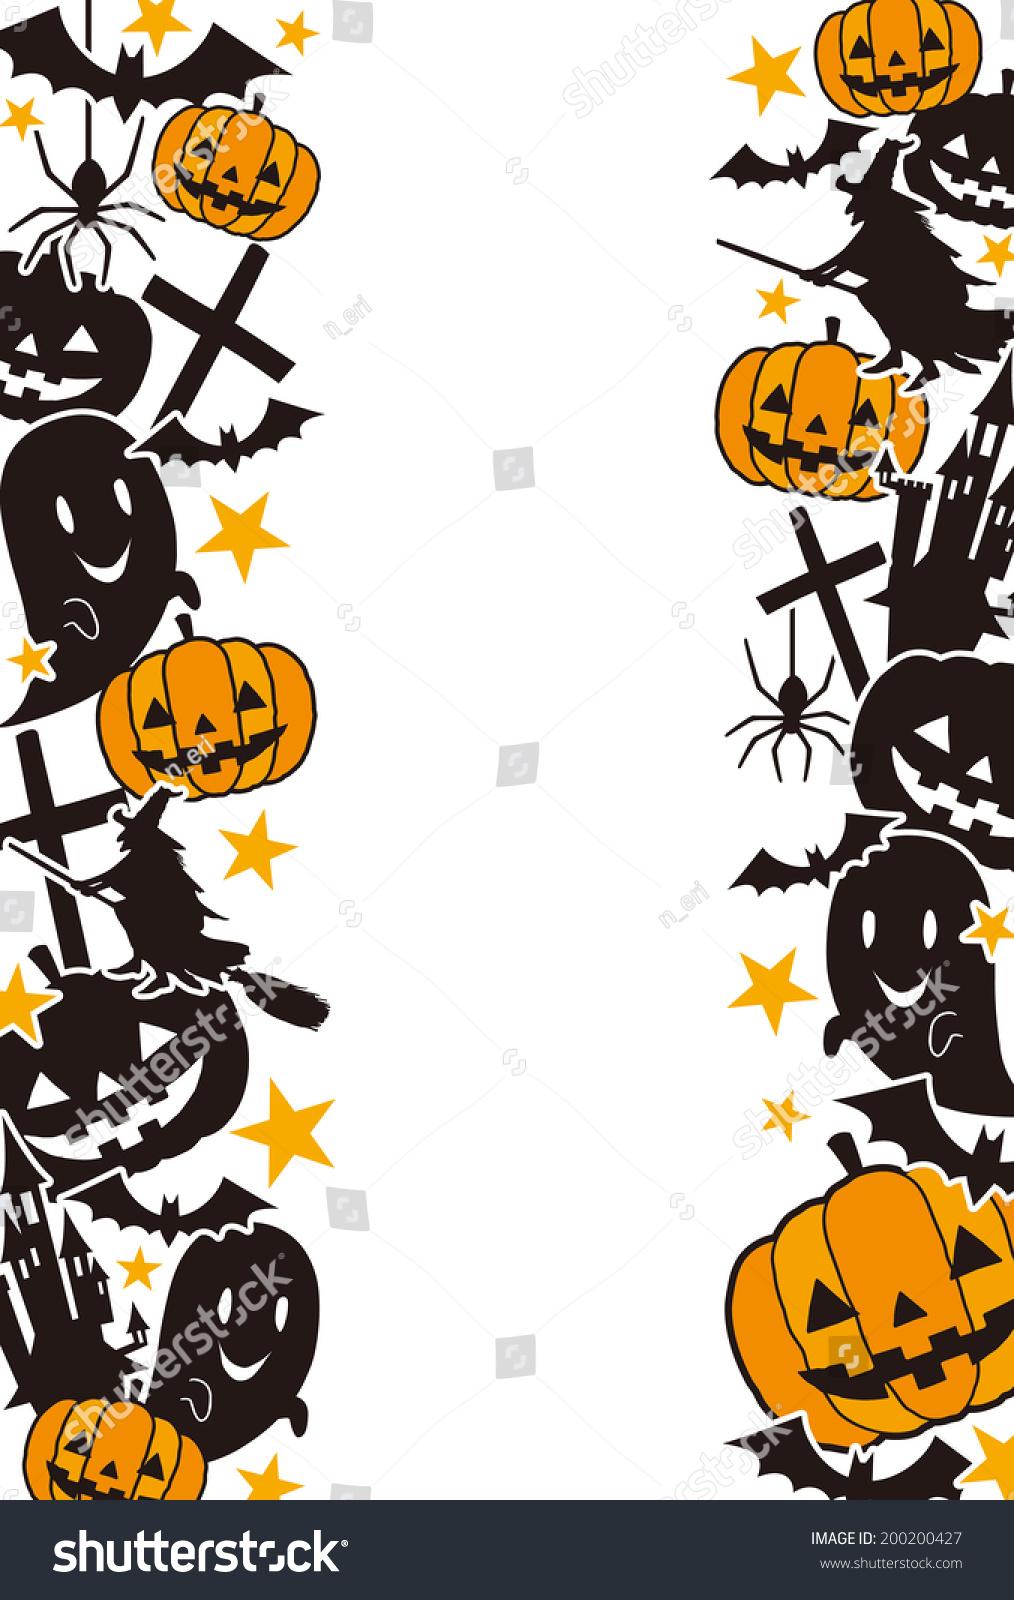 halloween frame stock vector (royalty free) 200200427 - shutterstock